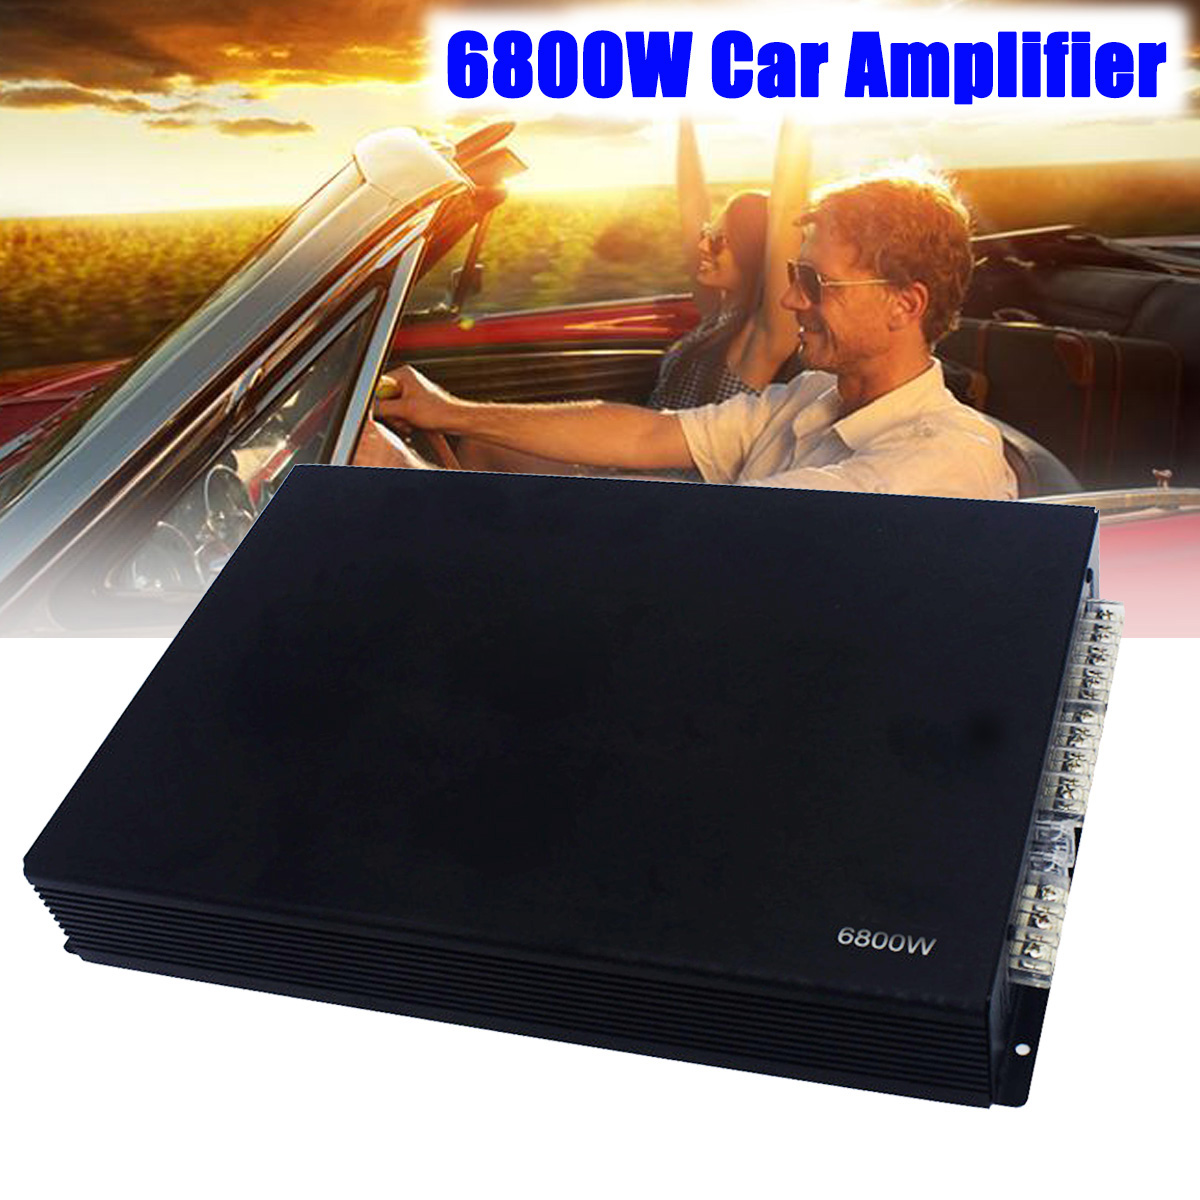 6800W Car Amplifier 4 Channel Bridgeable Car Audio Stereo Subwoofer Amplifier Truck Class AB Aluminium Alloy Car Amplifier hifi class bluetooth 4 2 audio receiver amplifier car stereo modify support aptx low delay